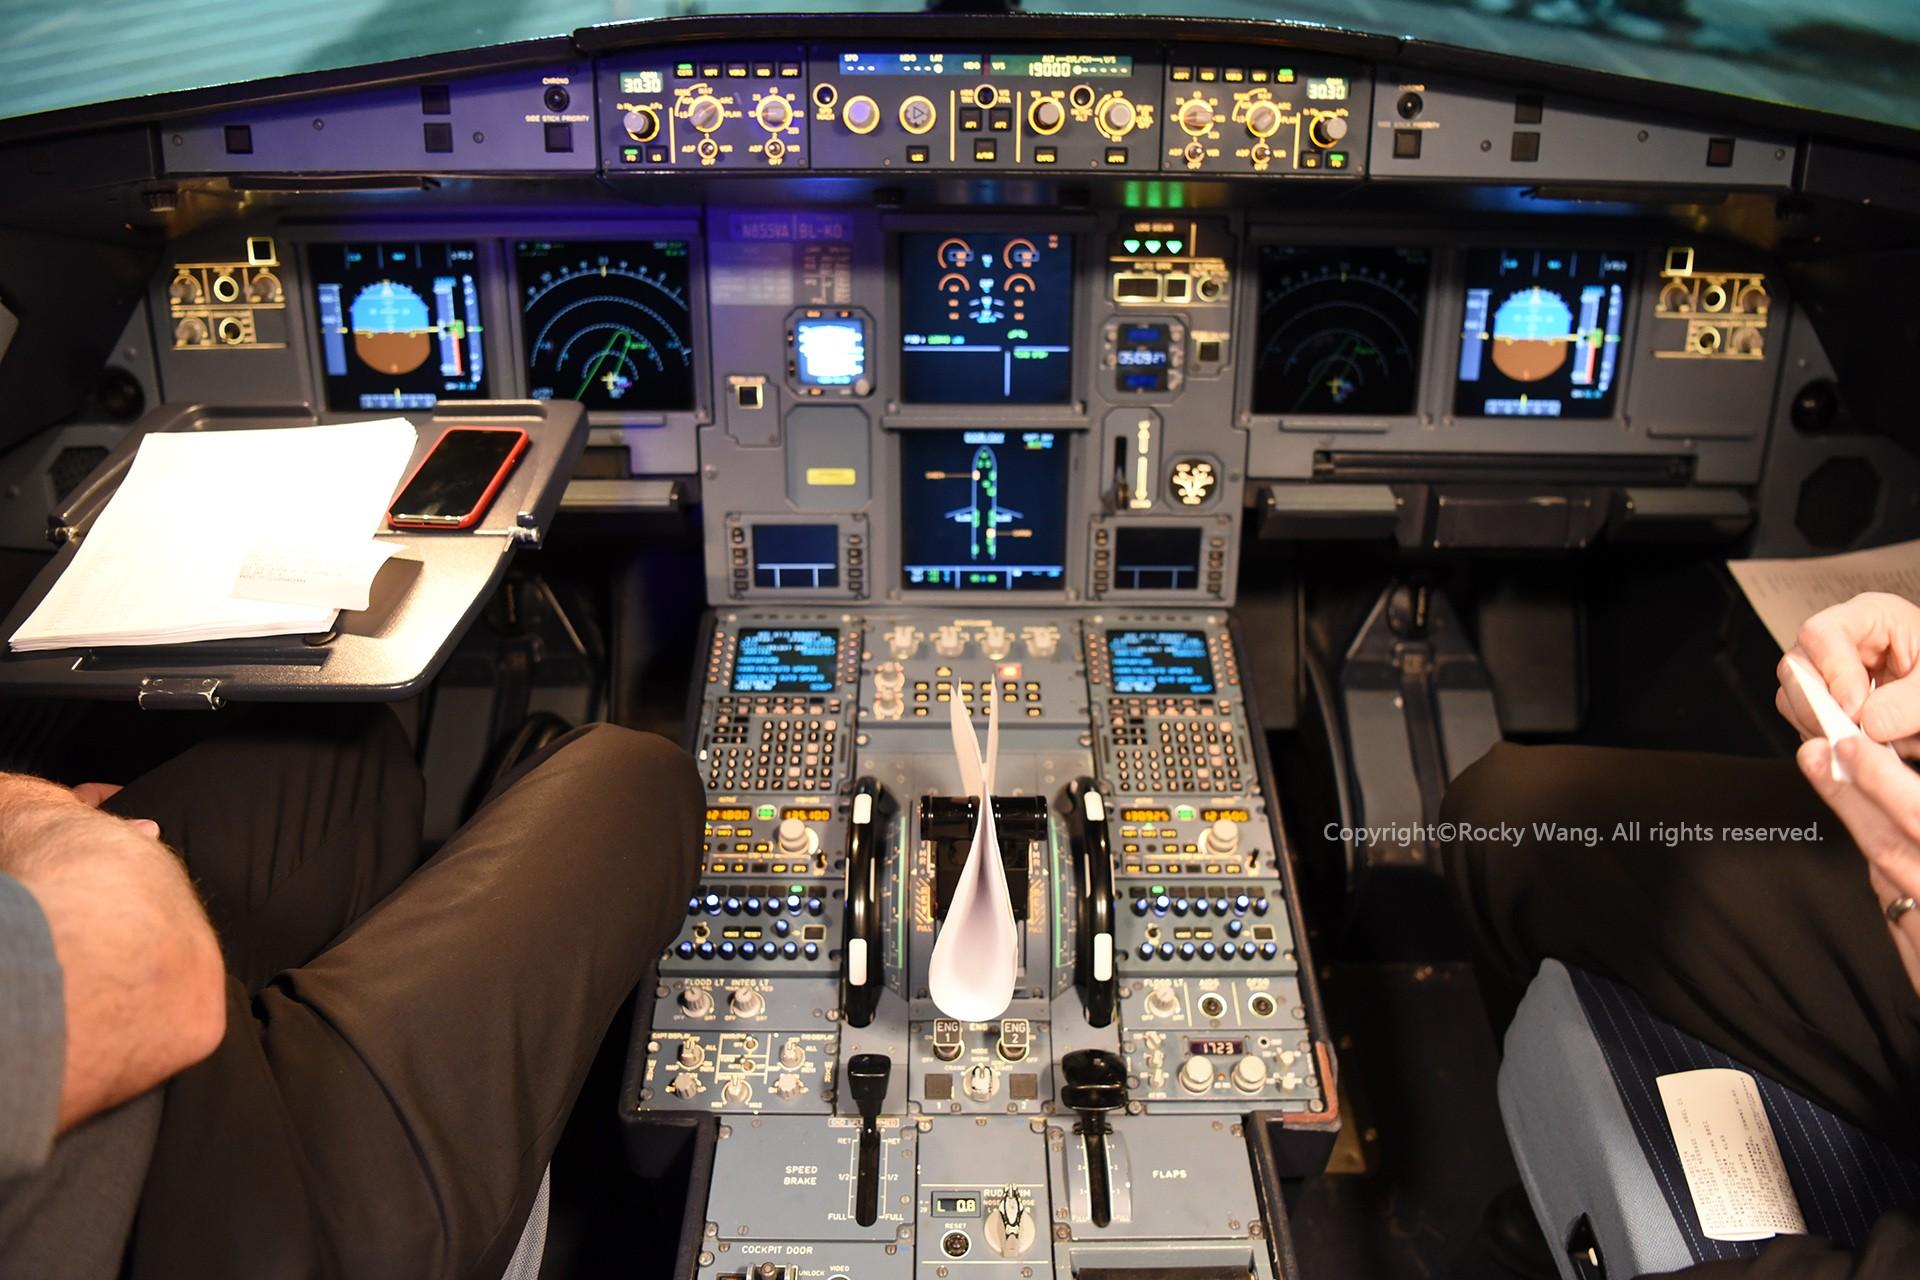 Re:[原创]简易版游记,纪念一次30段的环球飞行和一些碎碎念 AIRBUS A320-214 N855VA San Francisco Int'l Airport